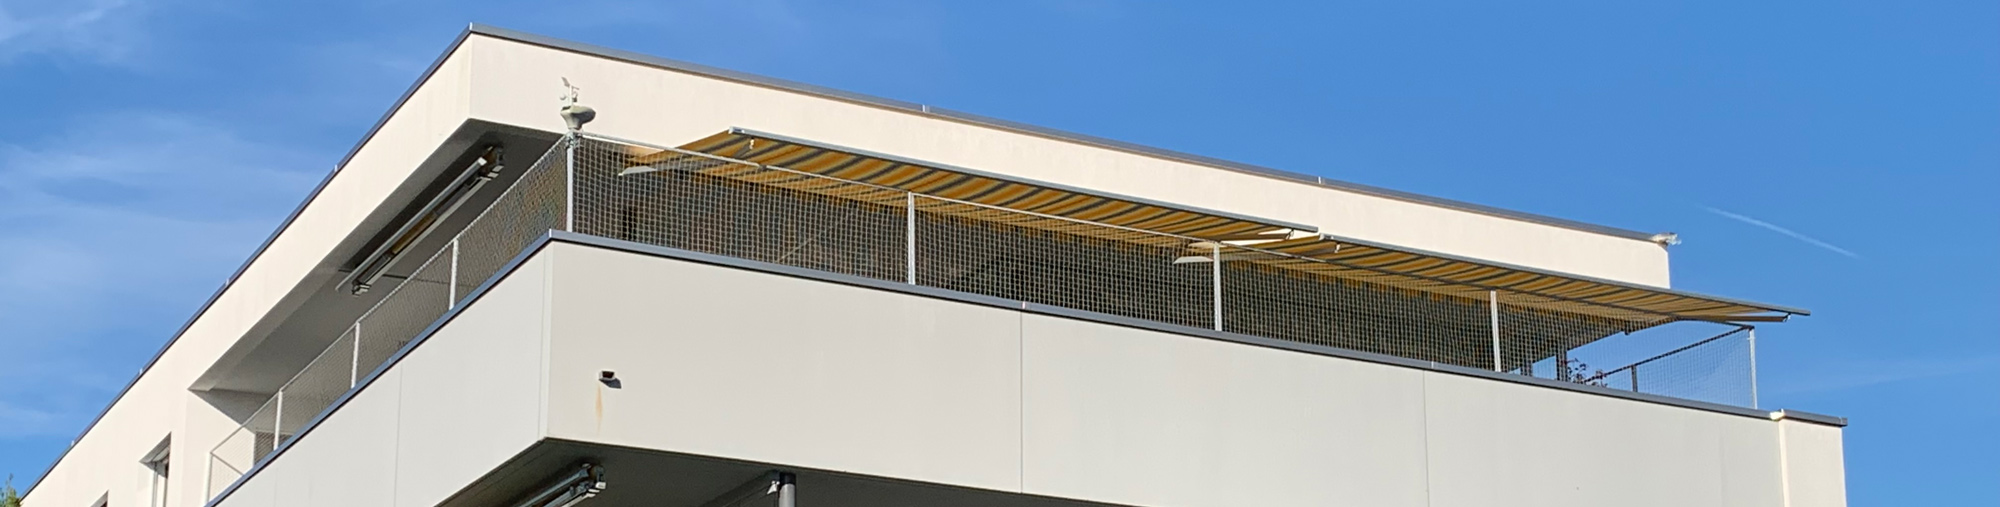 balkonnetzmontage